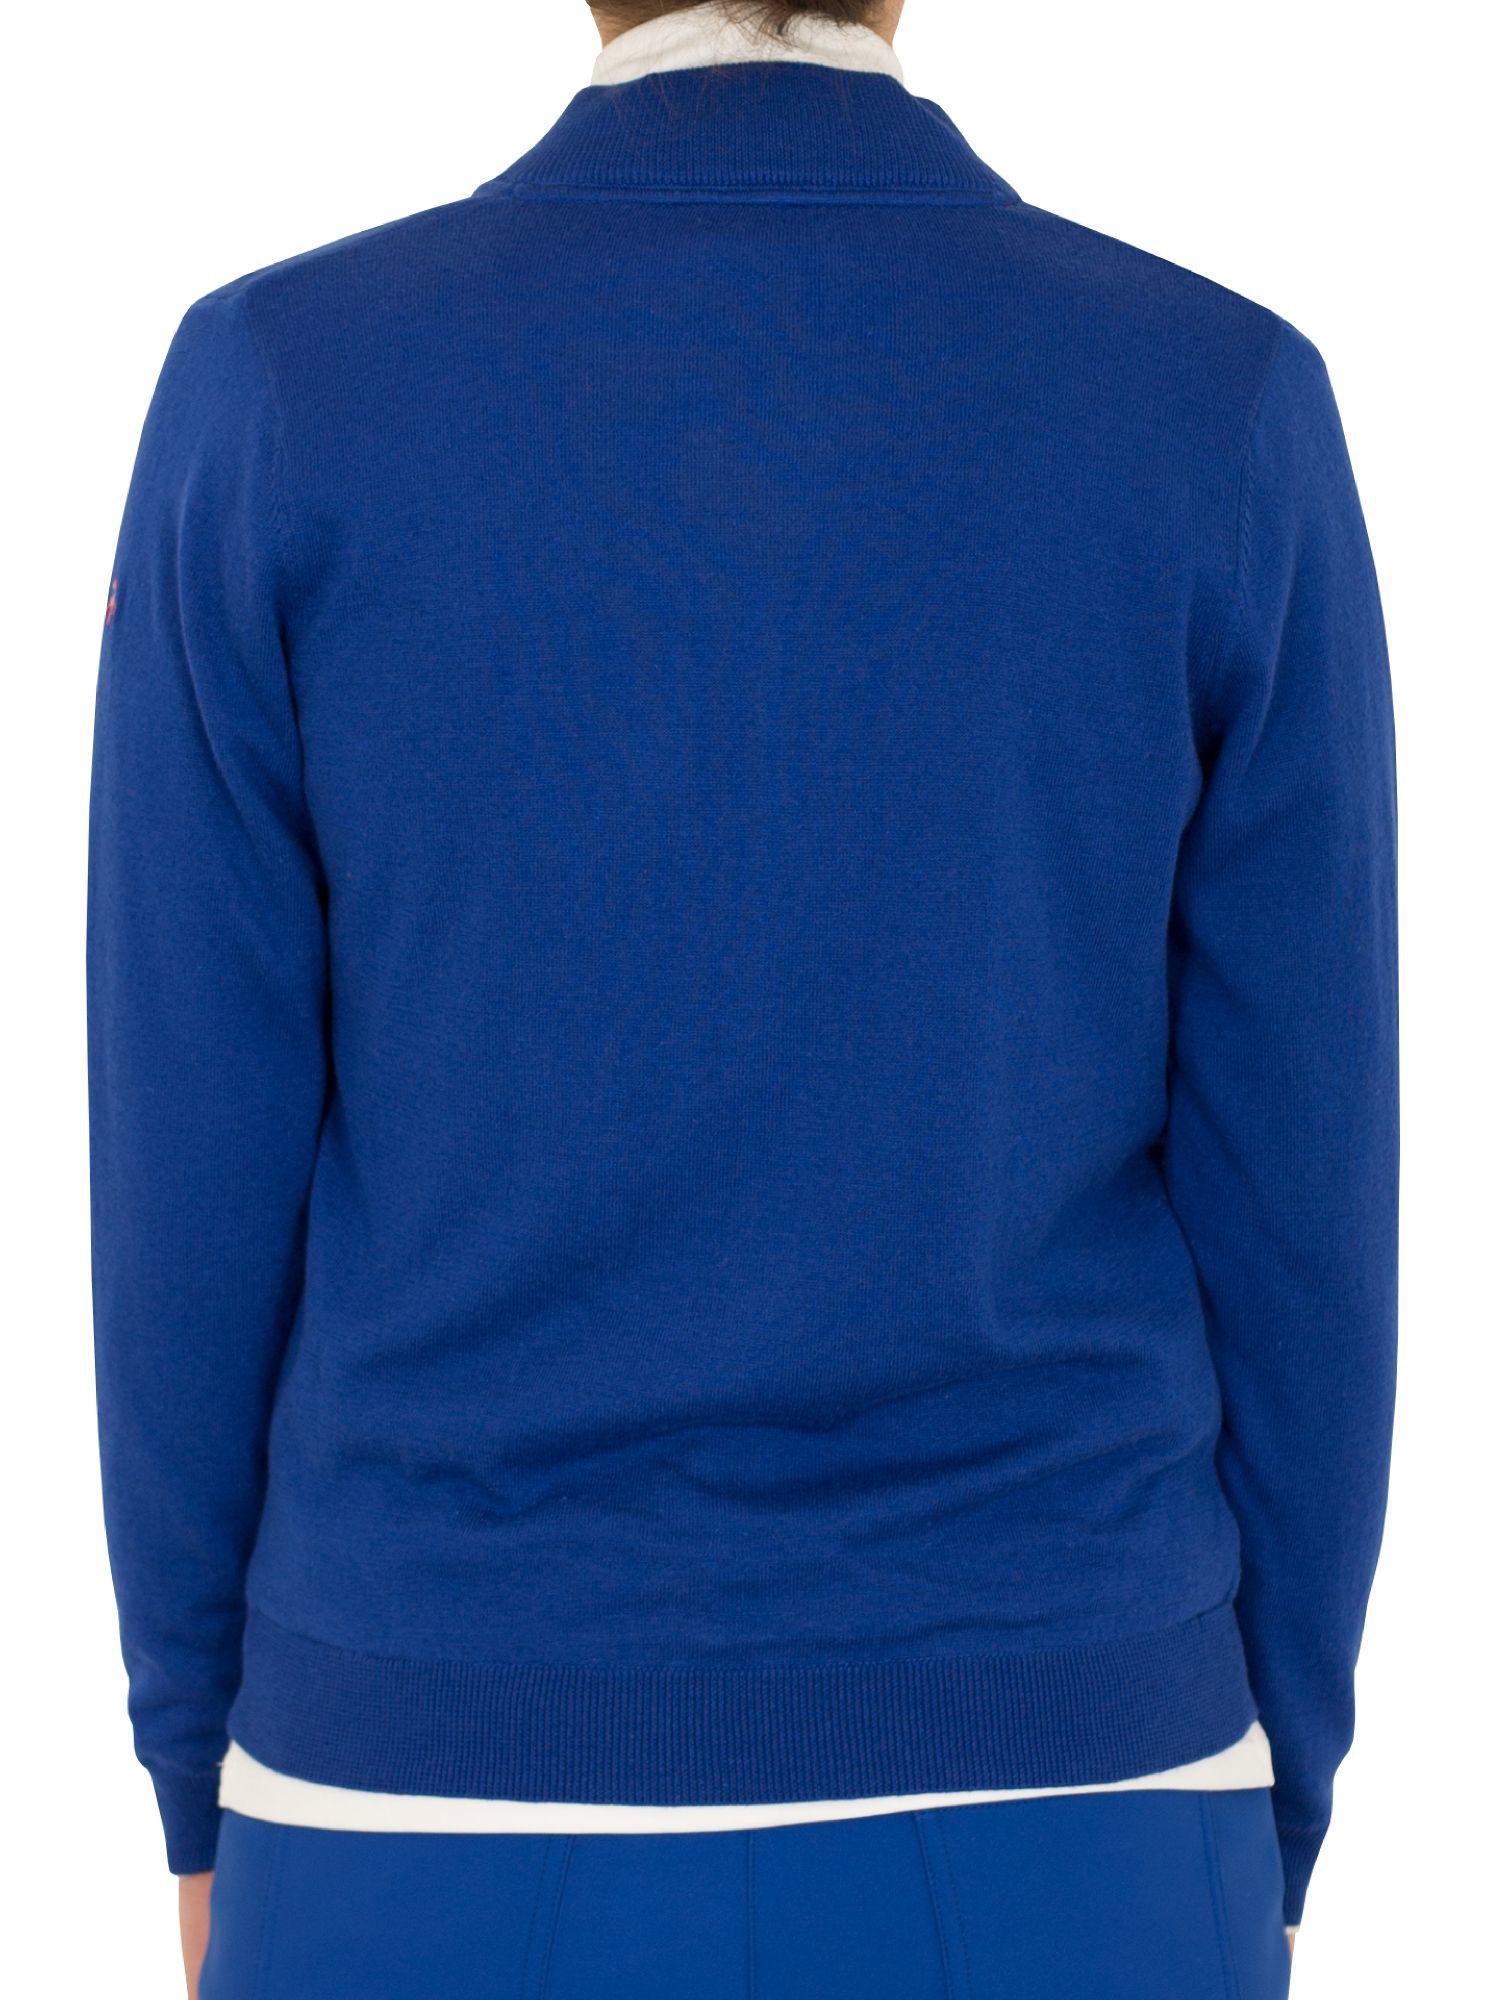 Green Lamb Synthetic Billie Lined Argyle Cardigan in Cobalt (Blue) for Men